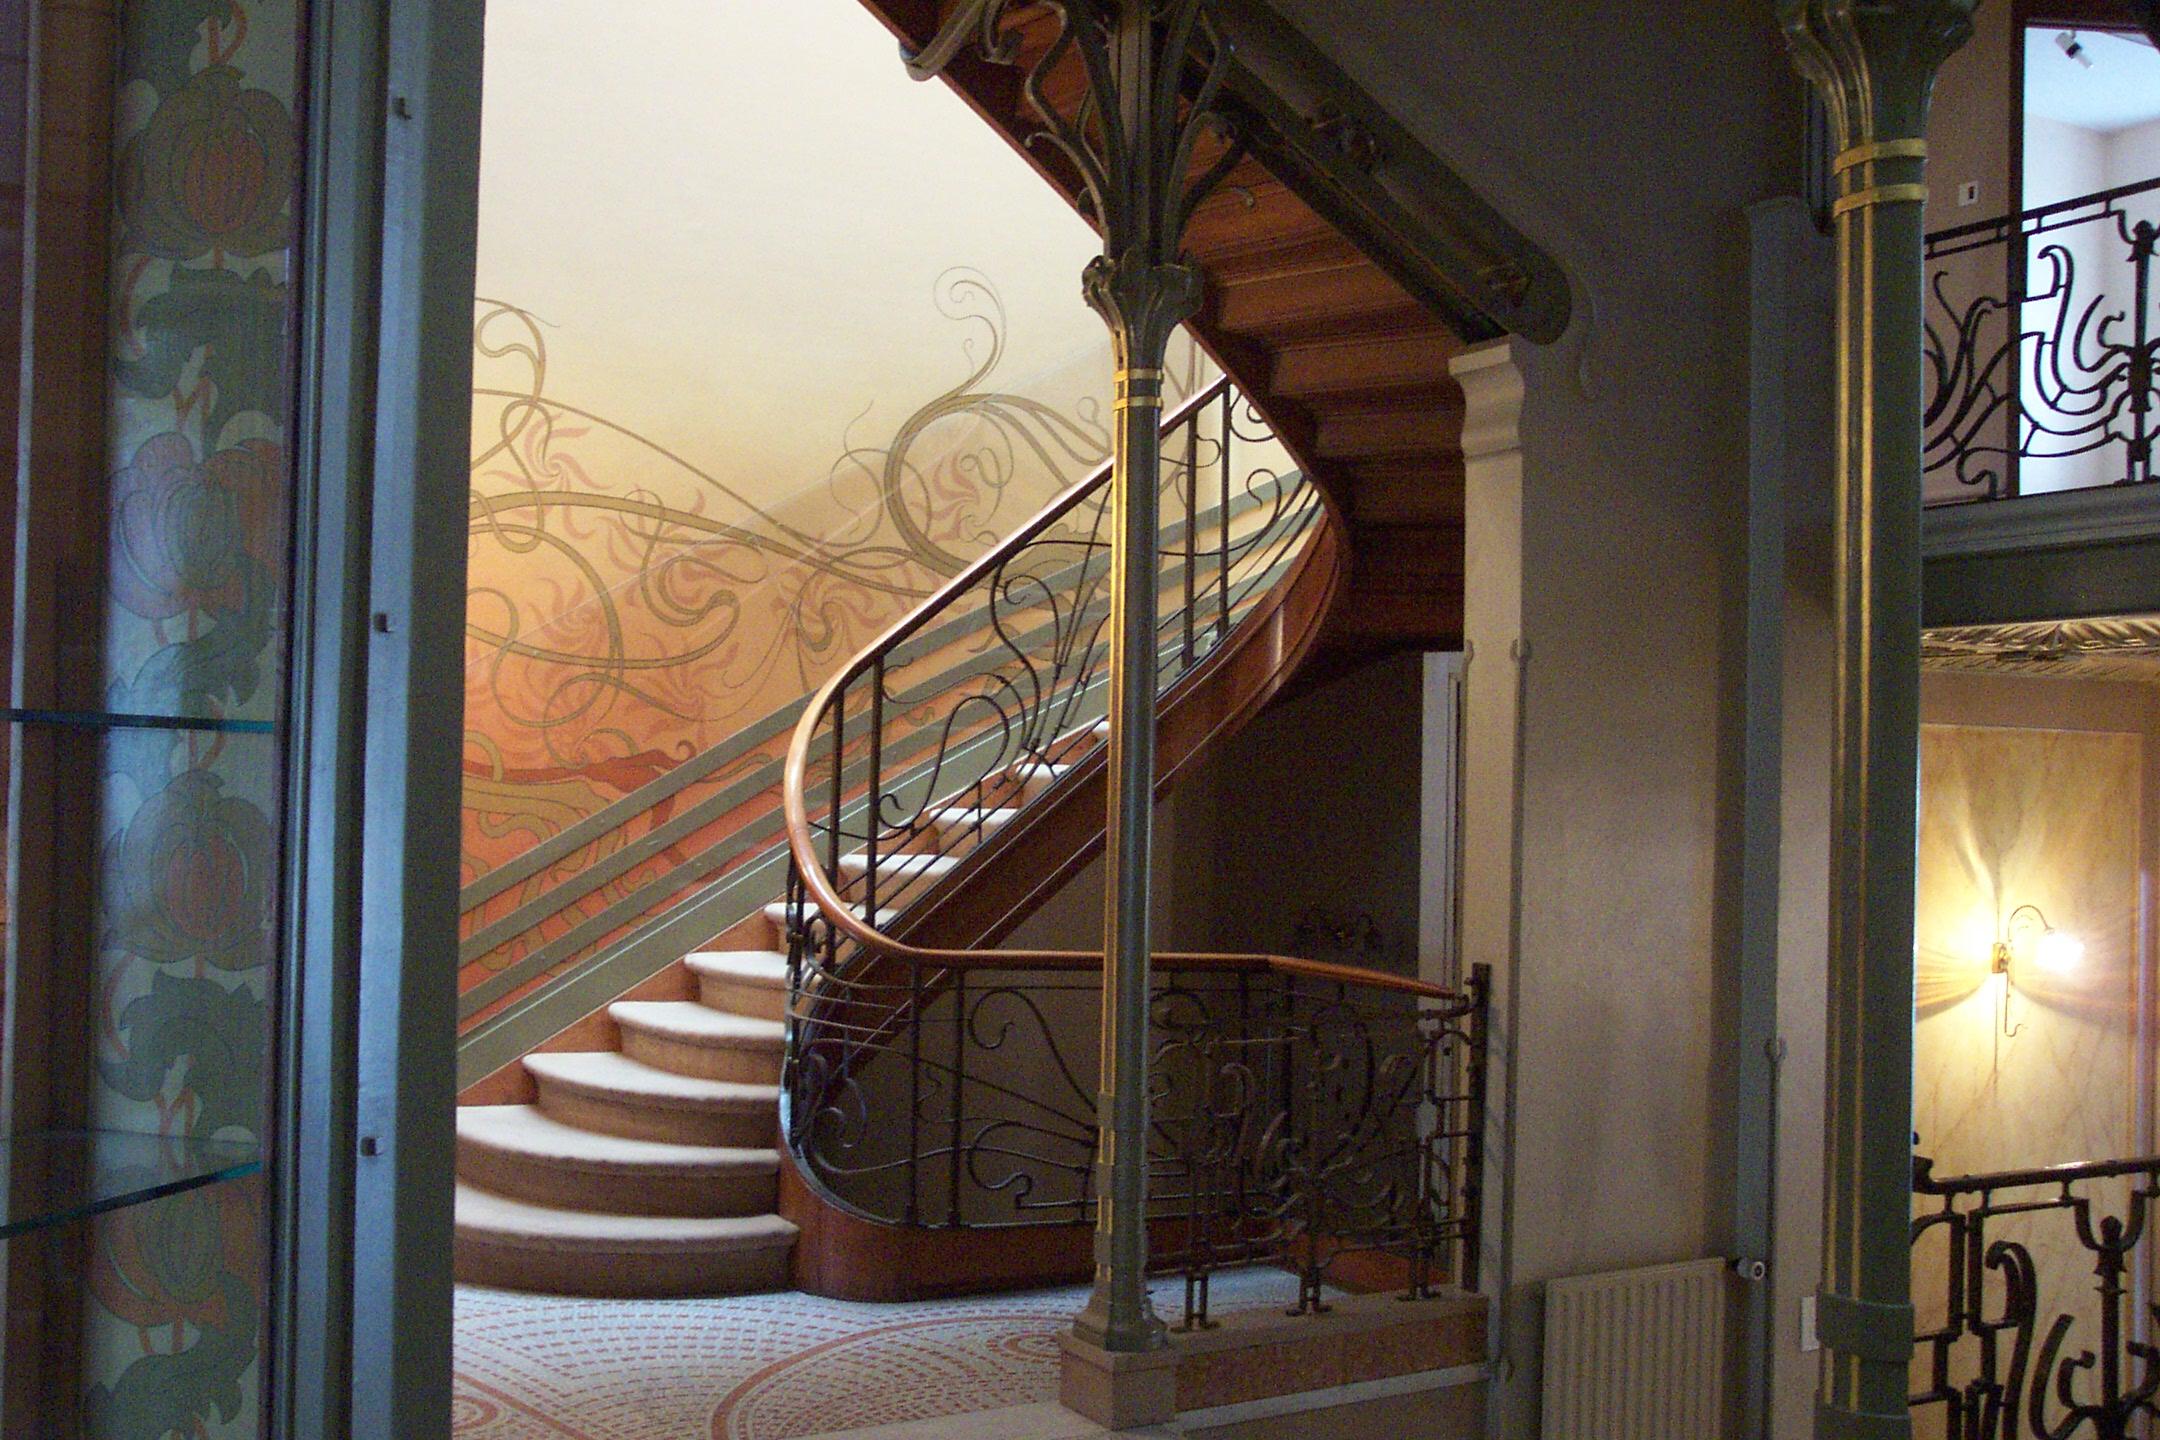 Tassel House Stairway © Henry Townsend/Wikimedia